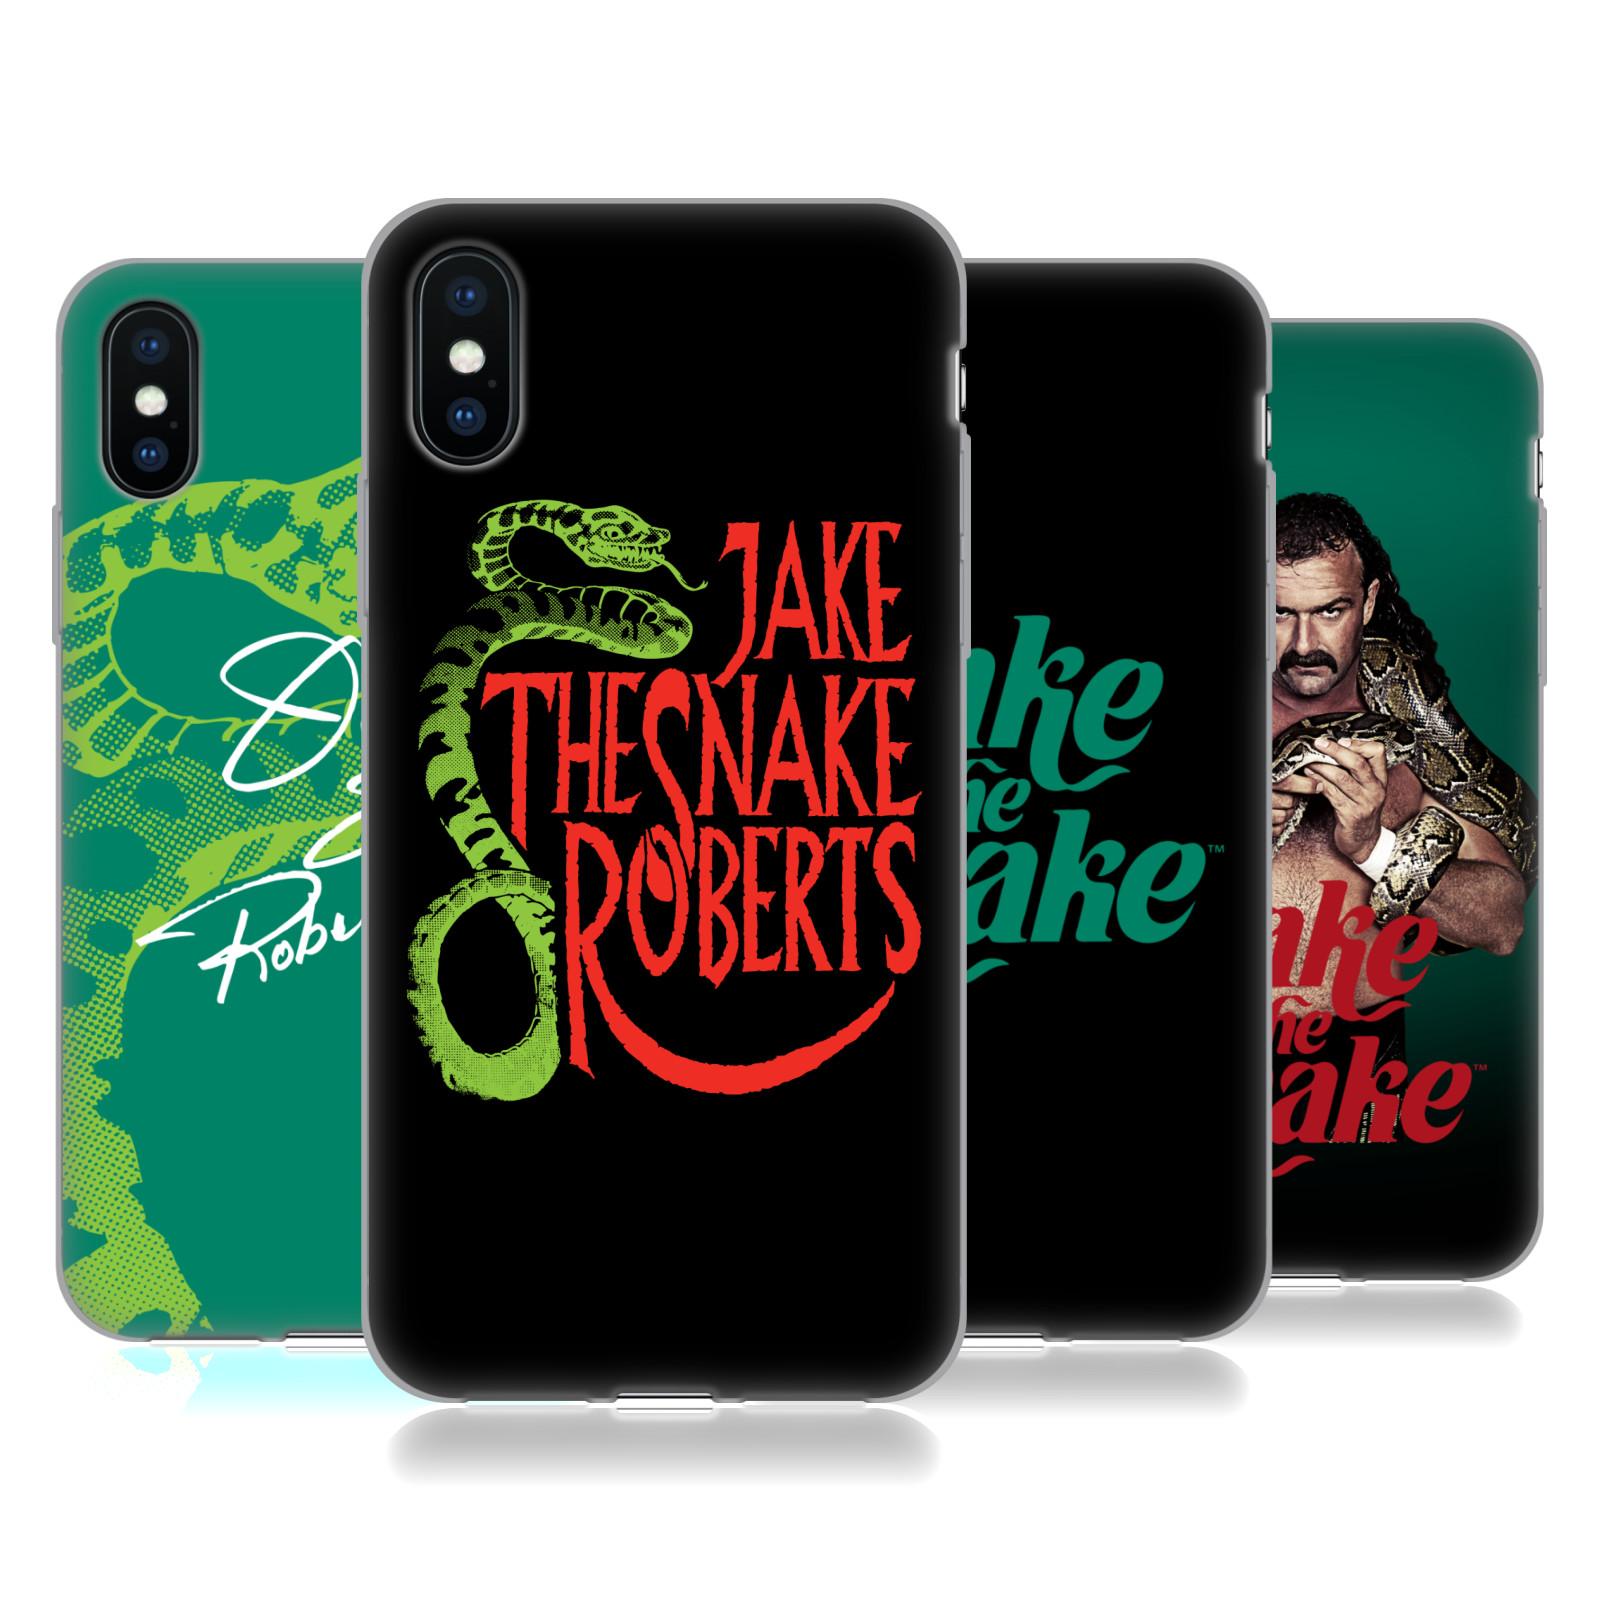 WWE <!--translate-lineup-->Jake The Snake Roberts<!--translate-lineup-->